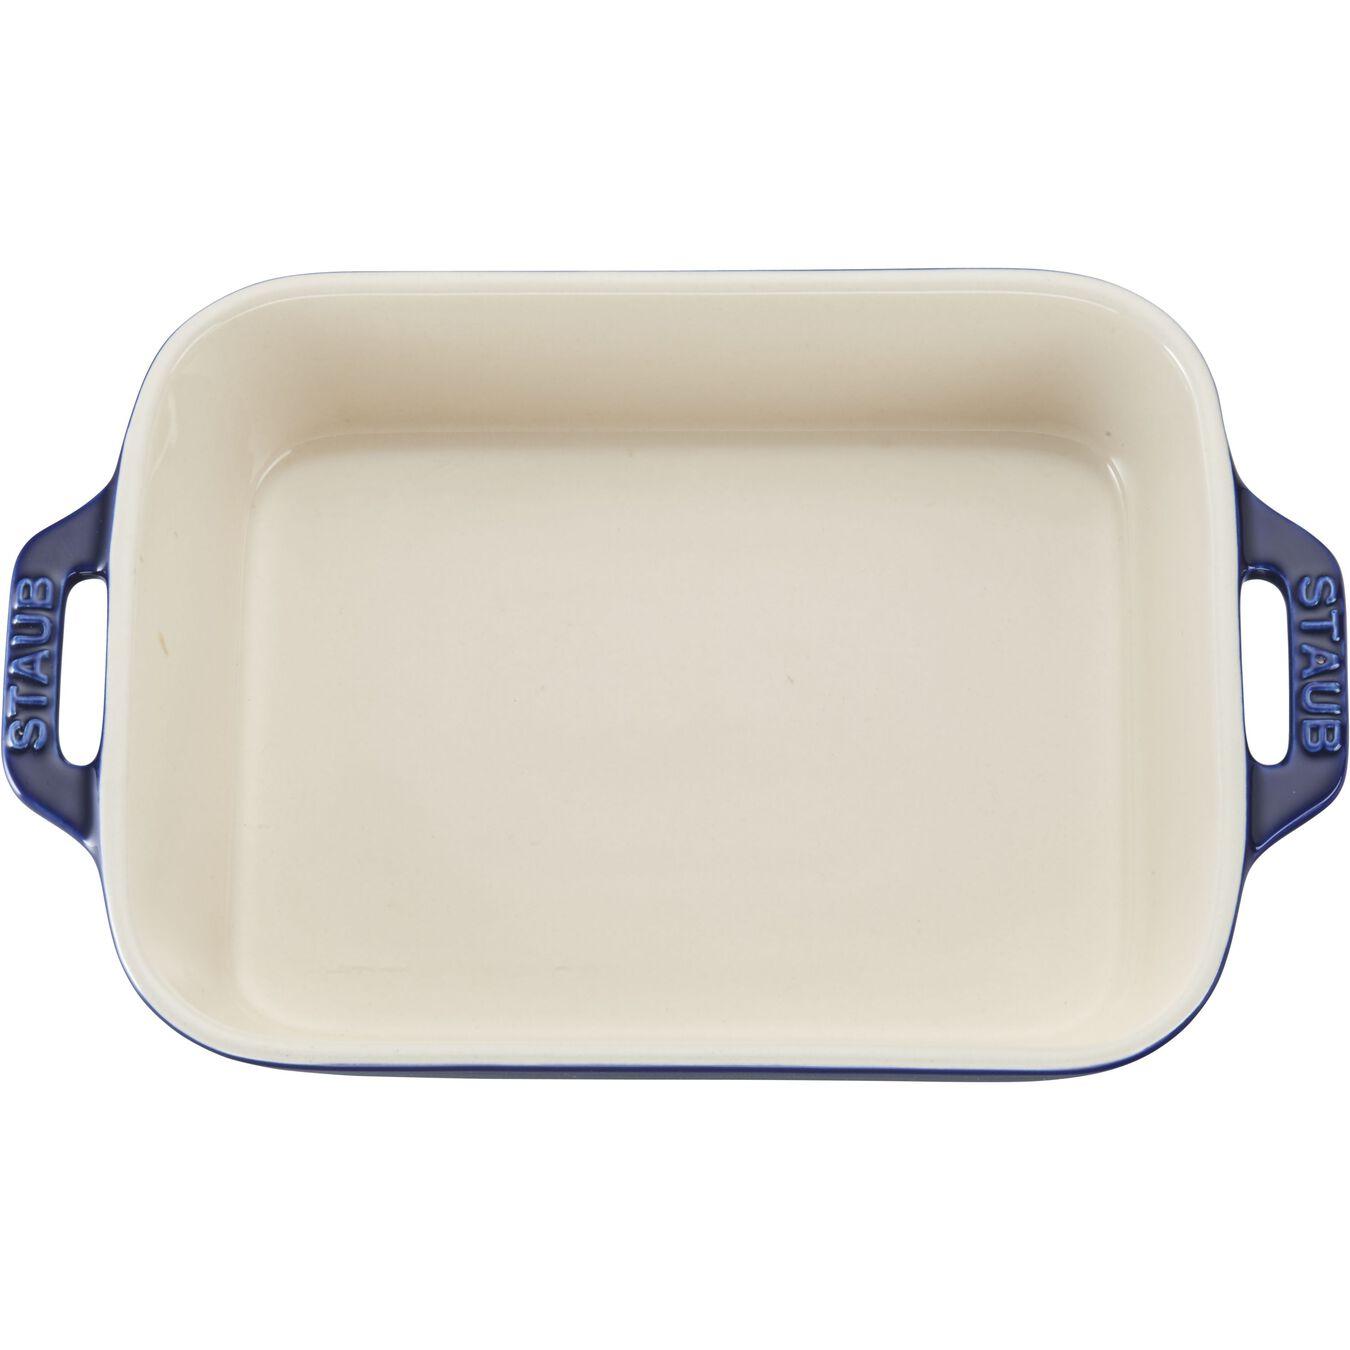 7.5-inch x 6-inch Rectangular Baking Dish - Dark Blue,,large 3